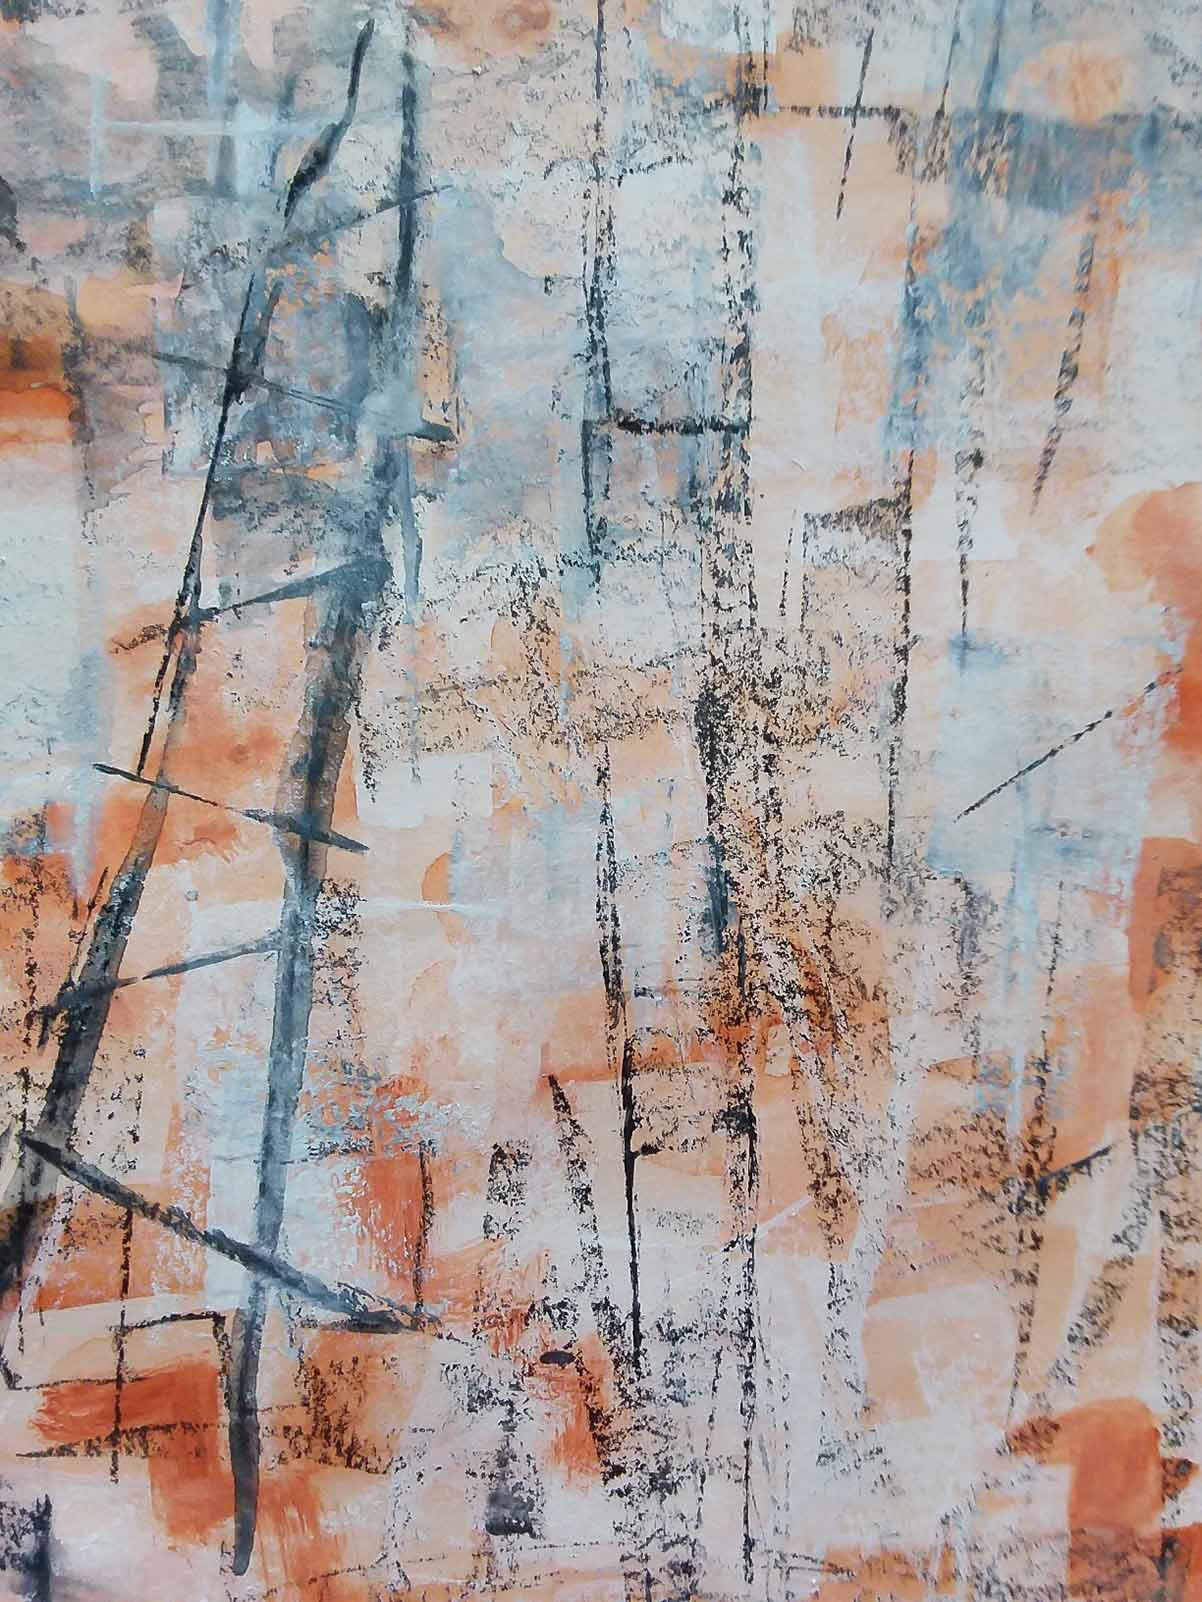 Small abstract. Mixed media